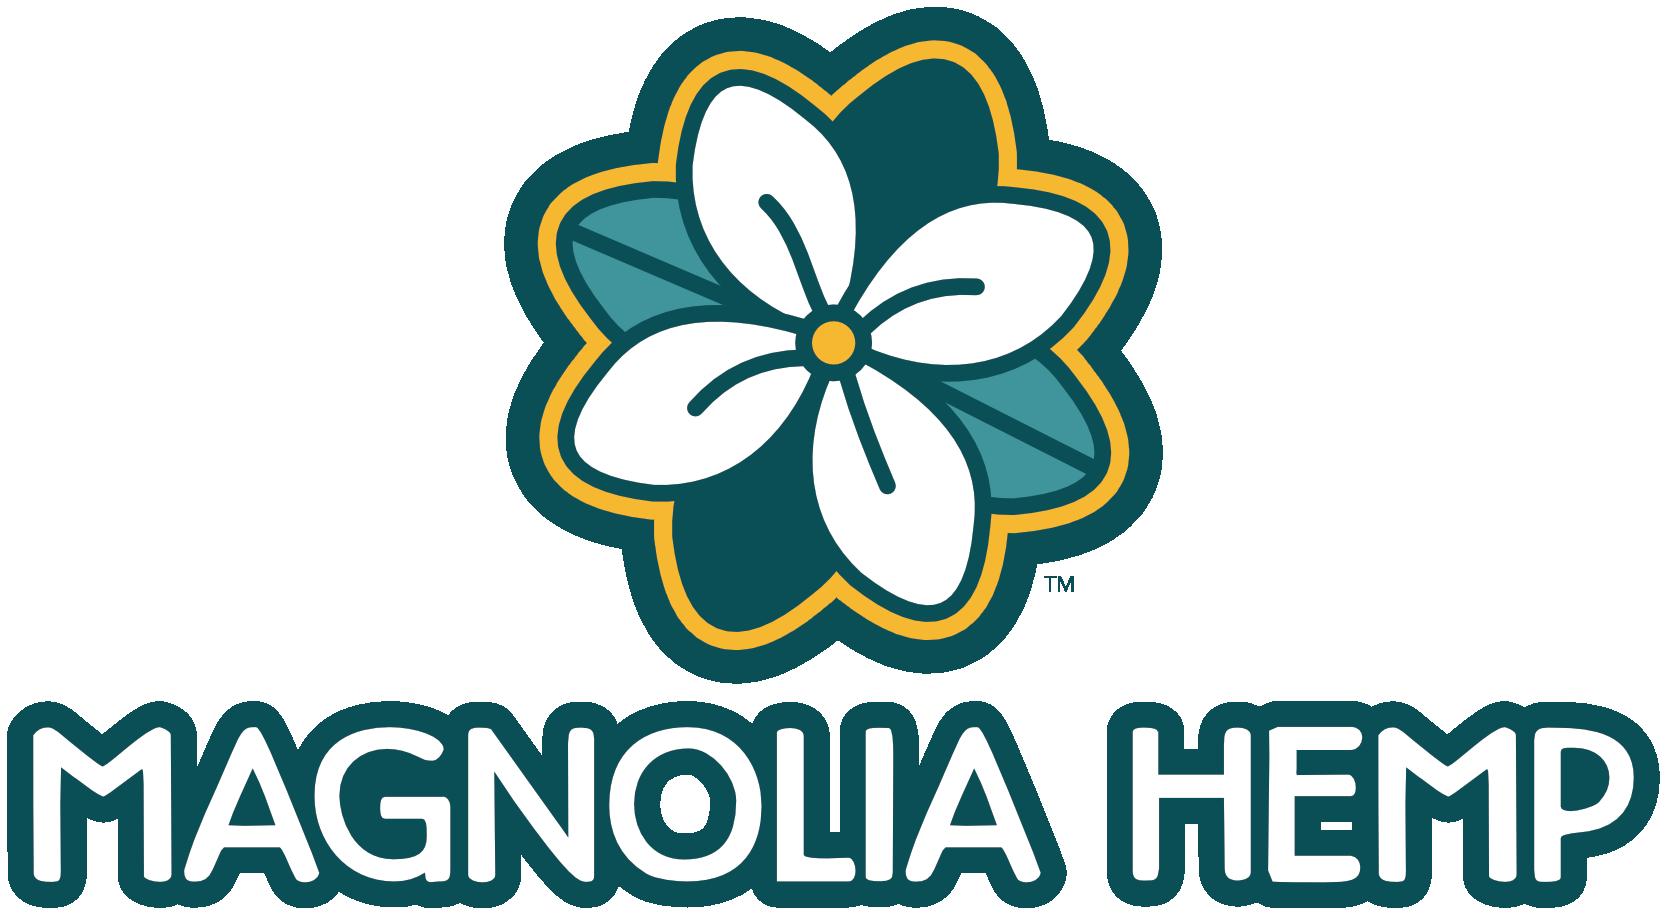 Magnolia Hemp